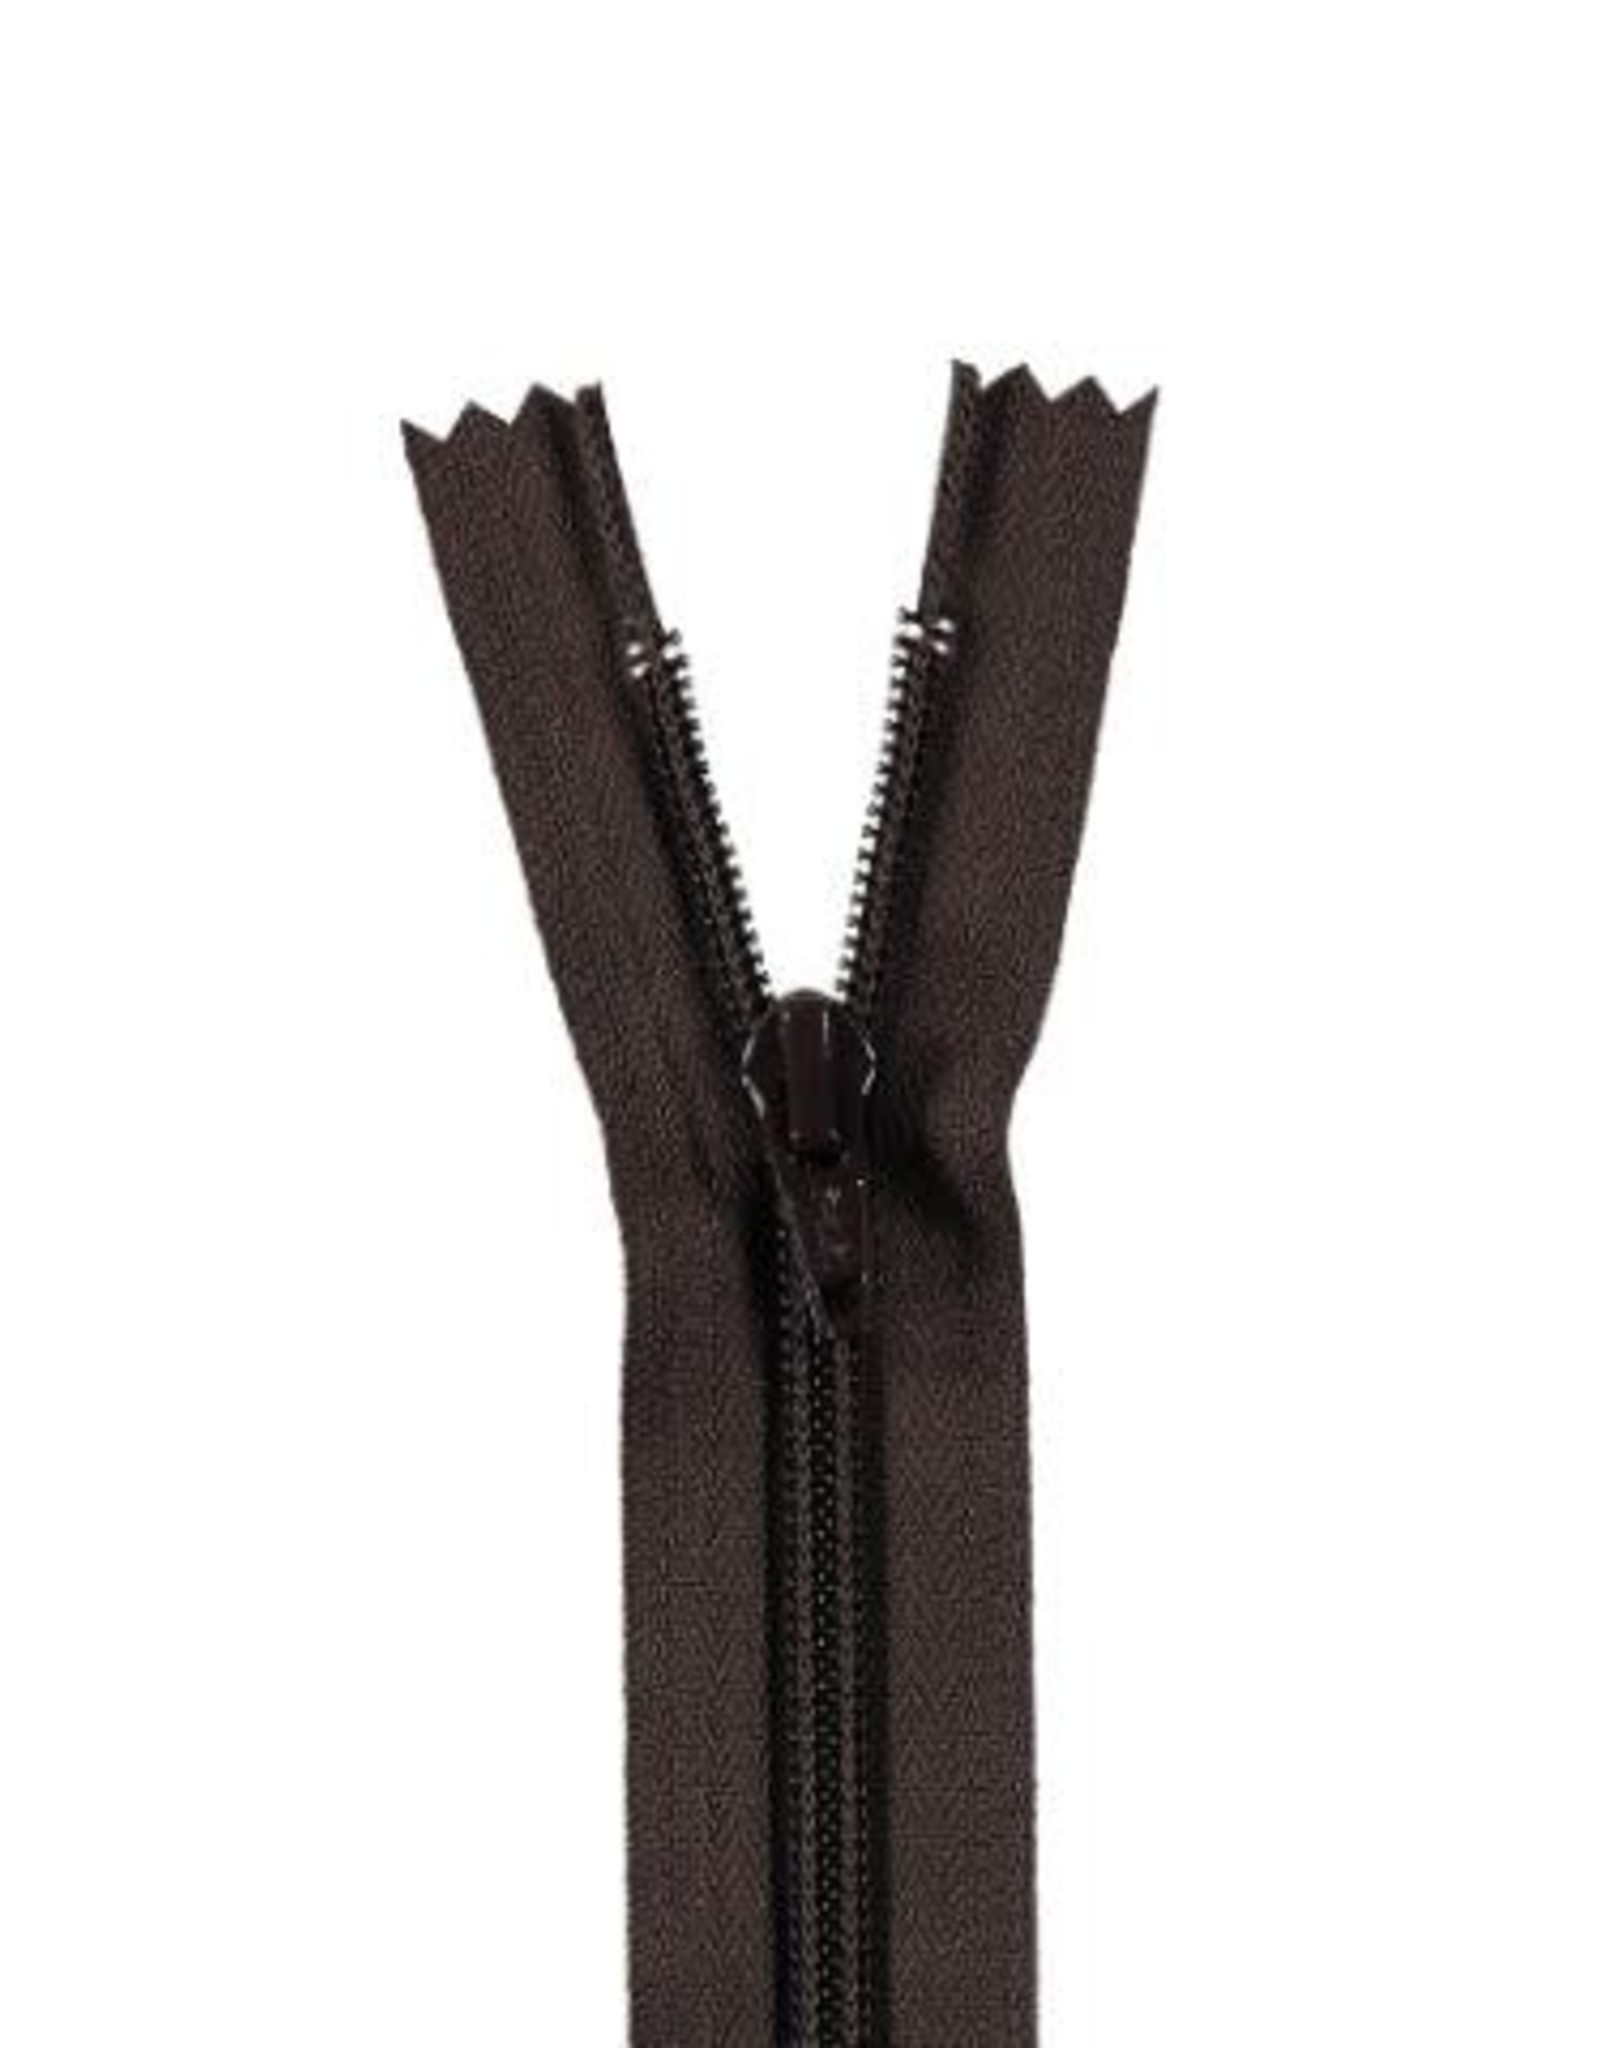 YKK Spiraalrits niet-DB 3mm donker bruin 570-35cm